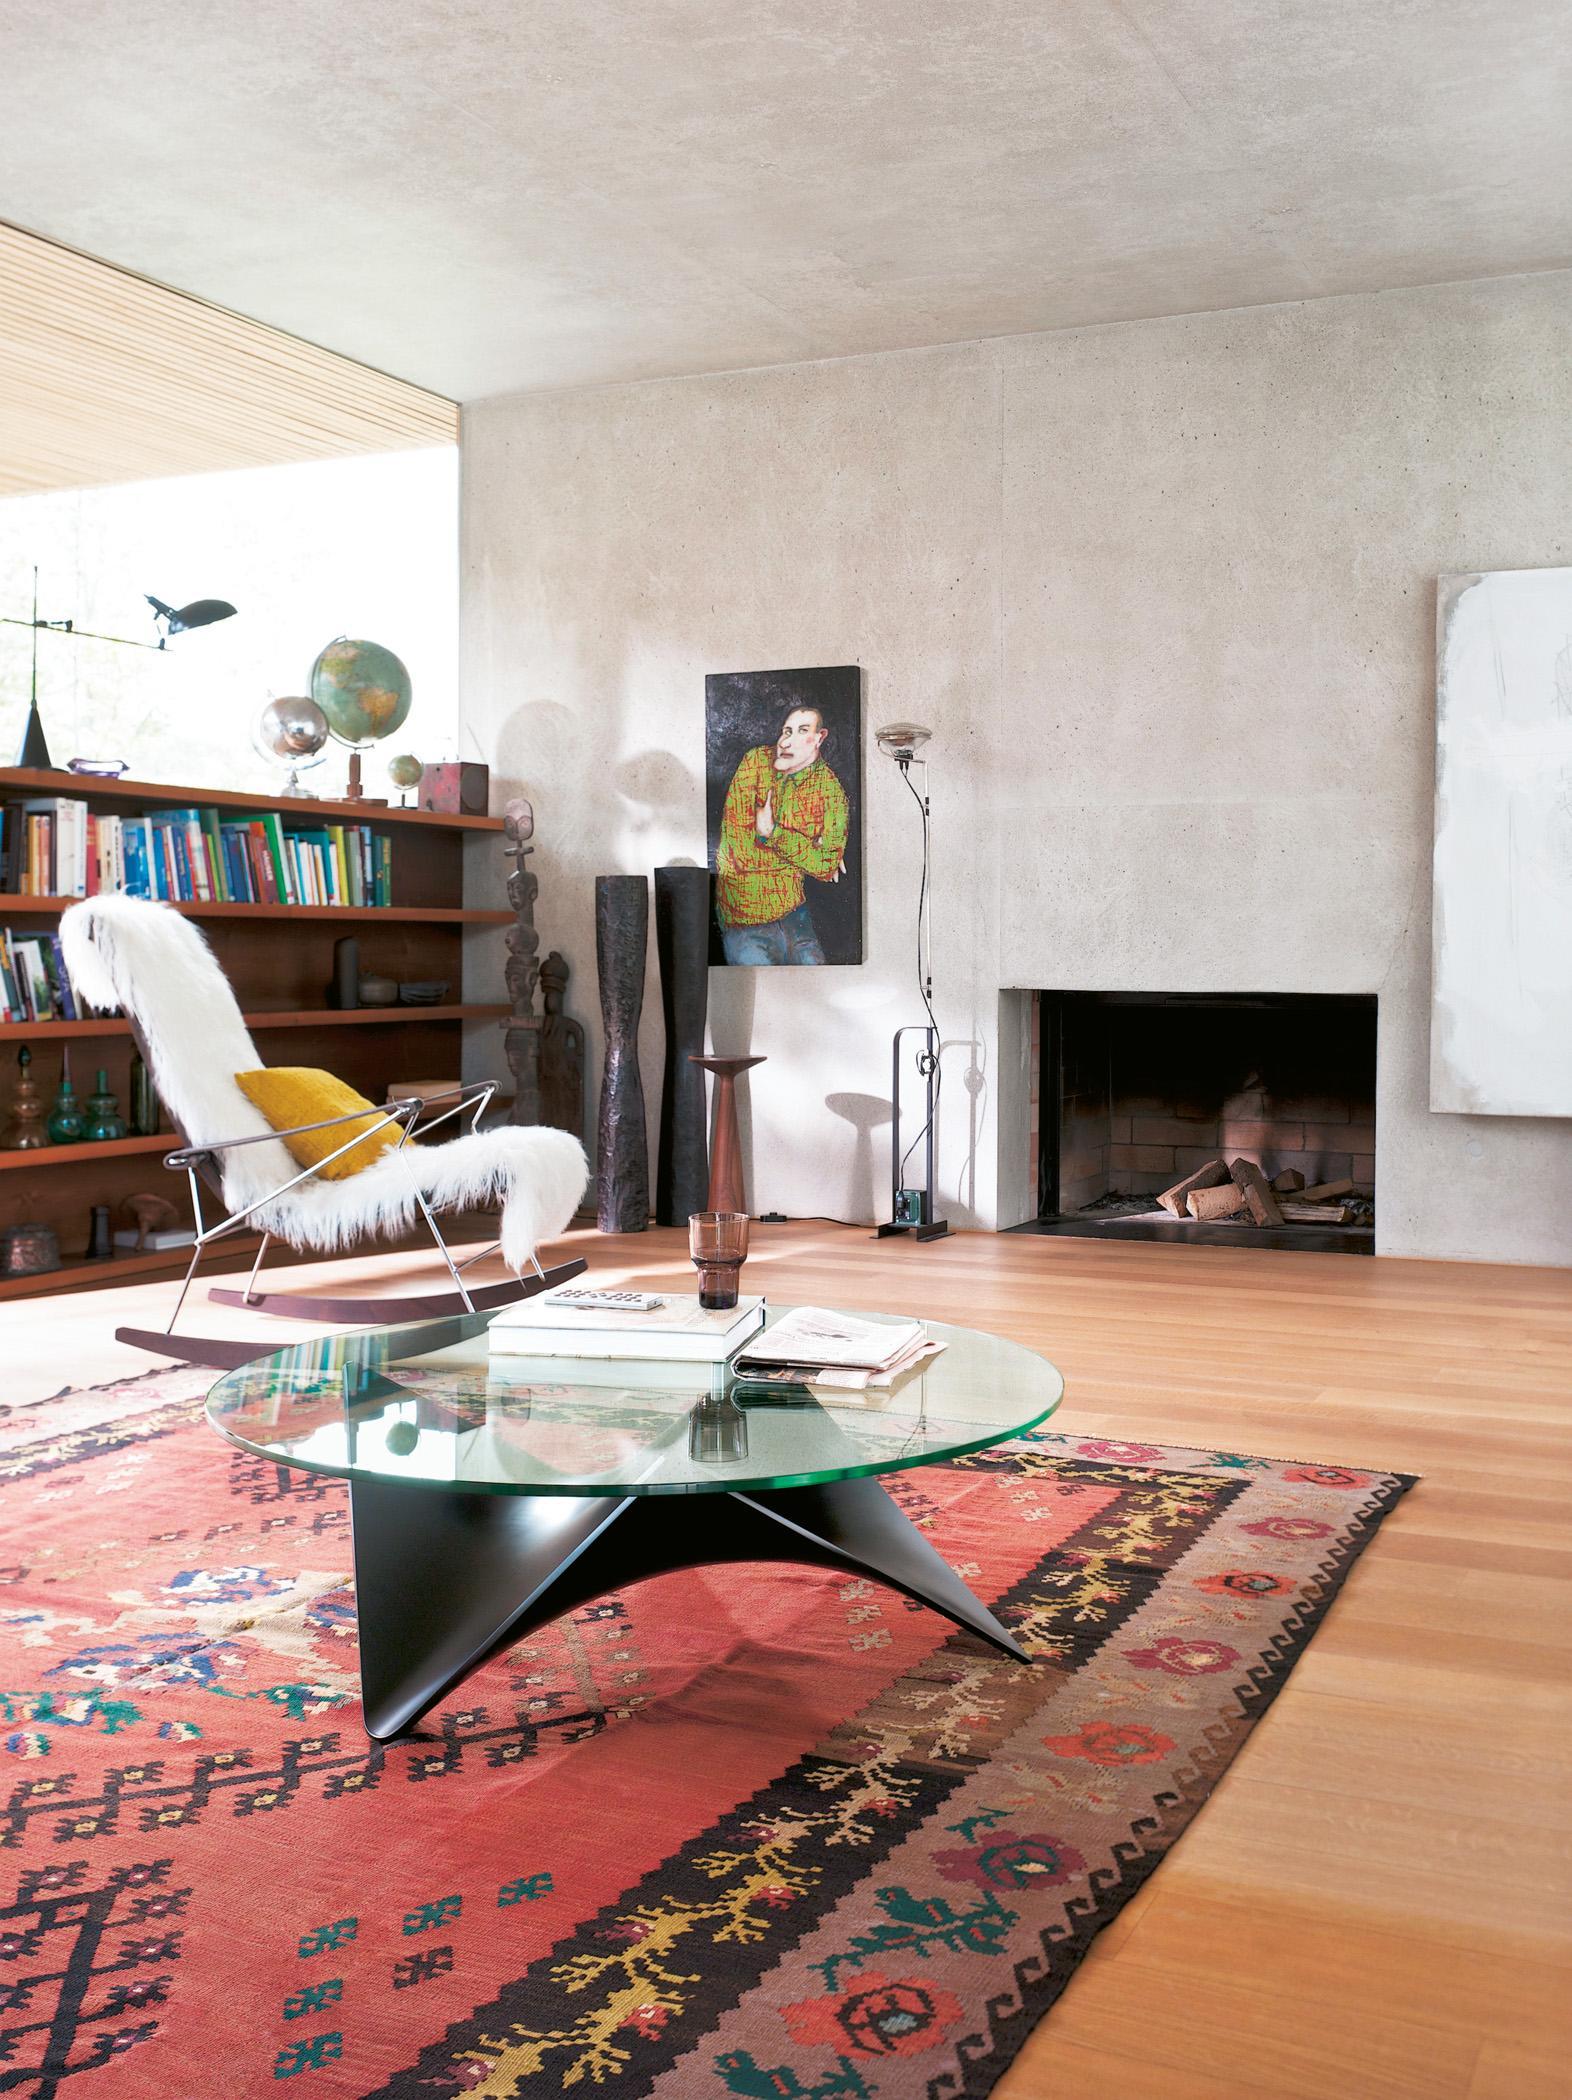 Industrial Design Trifft Retro #couchtisch #wandregal #kamin  #grauewandgestaltung #schaukelstuhl ©Draenert